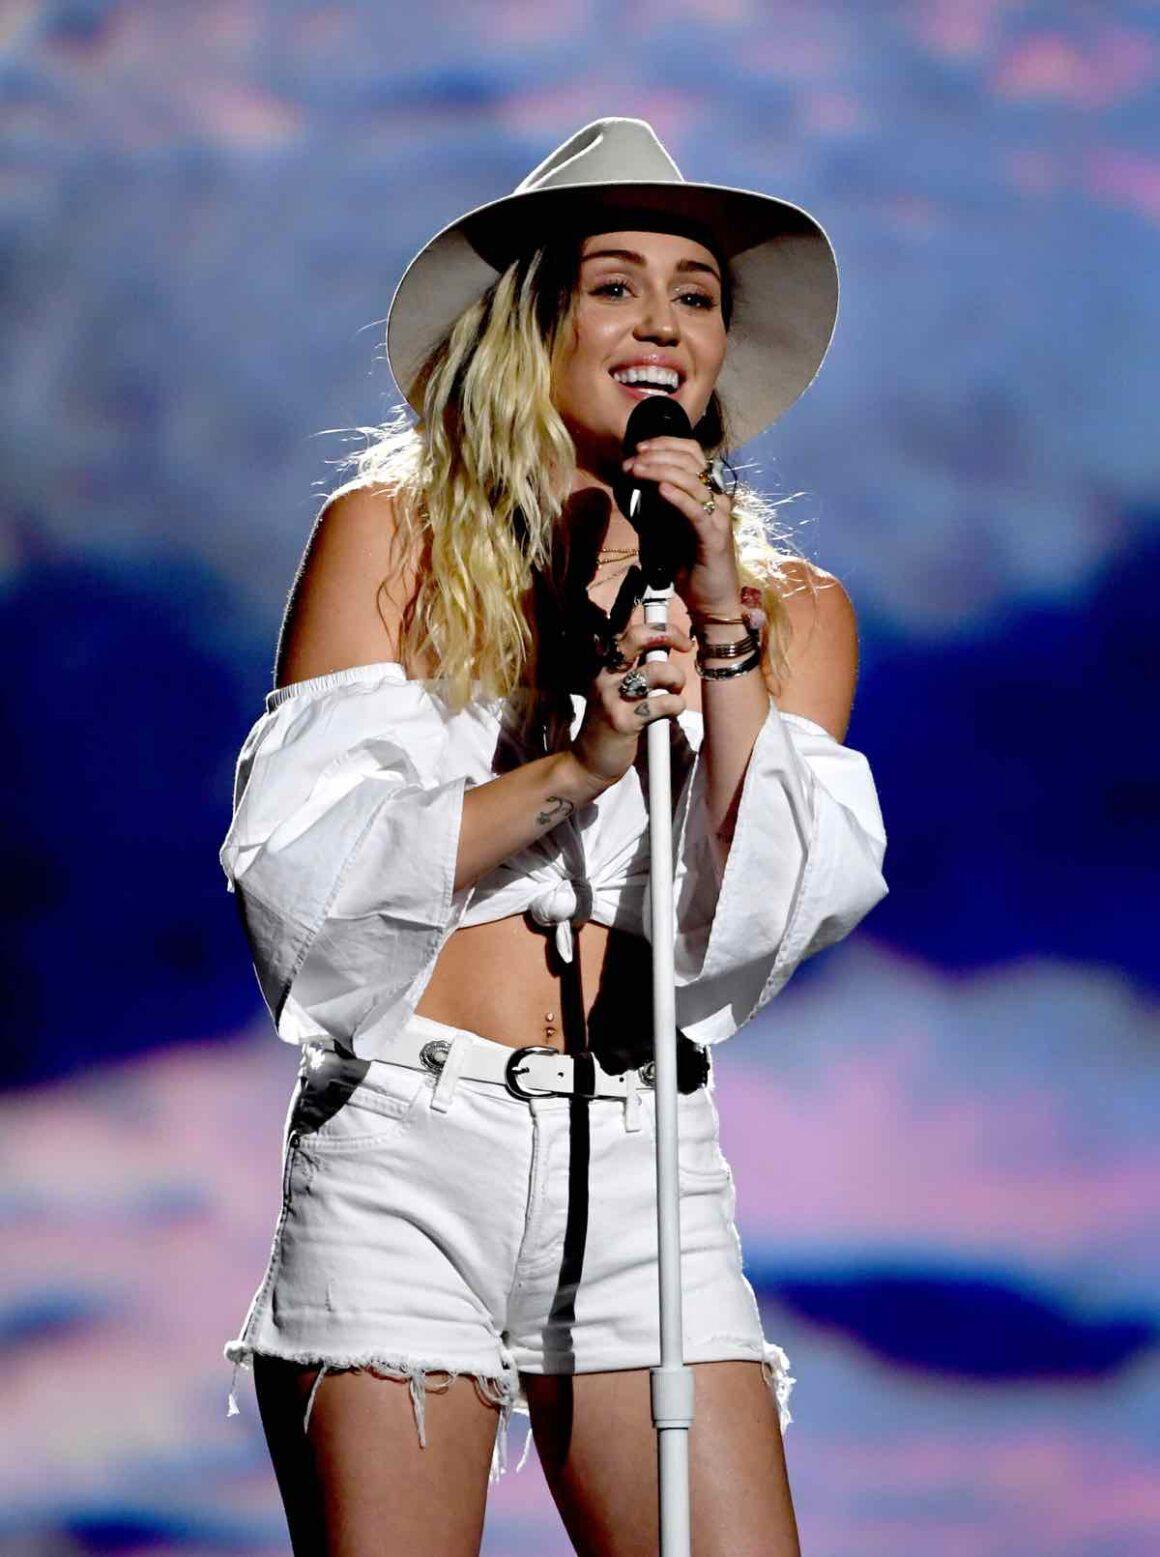 Miley Cyrus 2017 Billboard Music Awards - Show